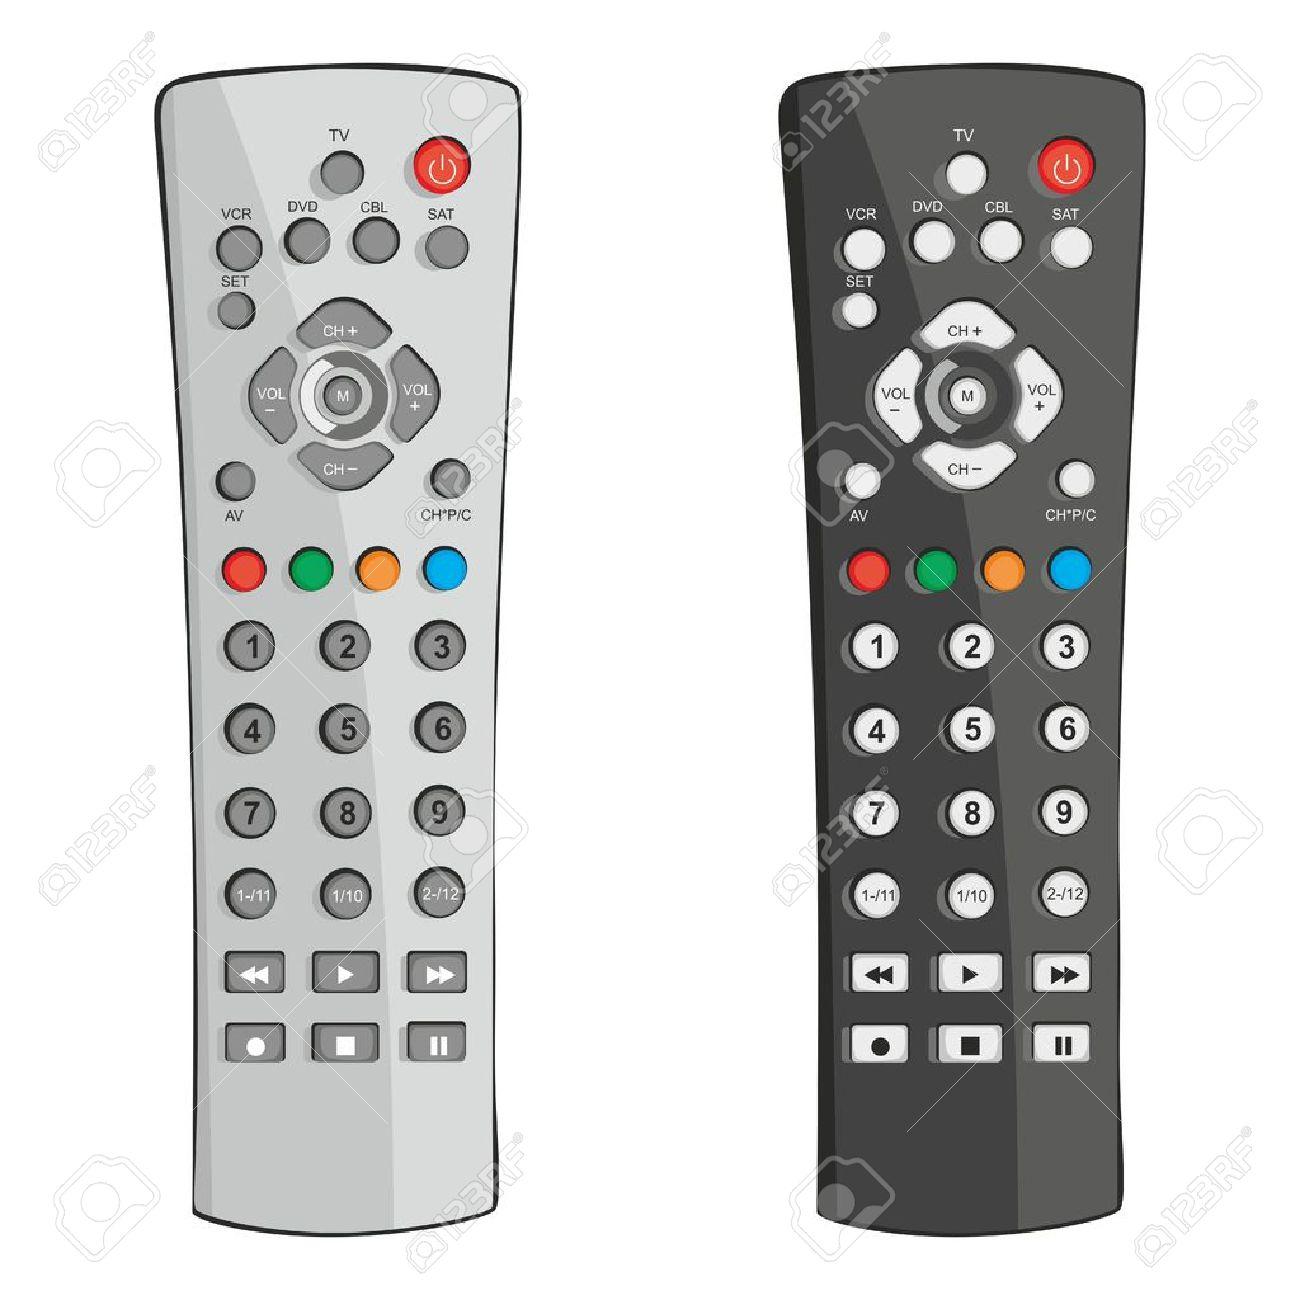 fully editable illustration remote control - 8842032